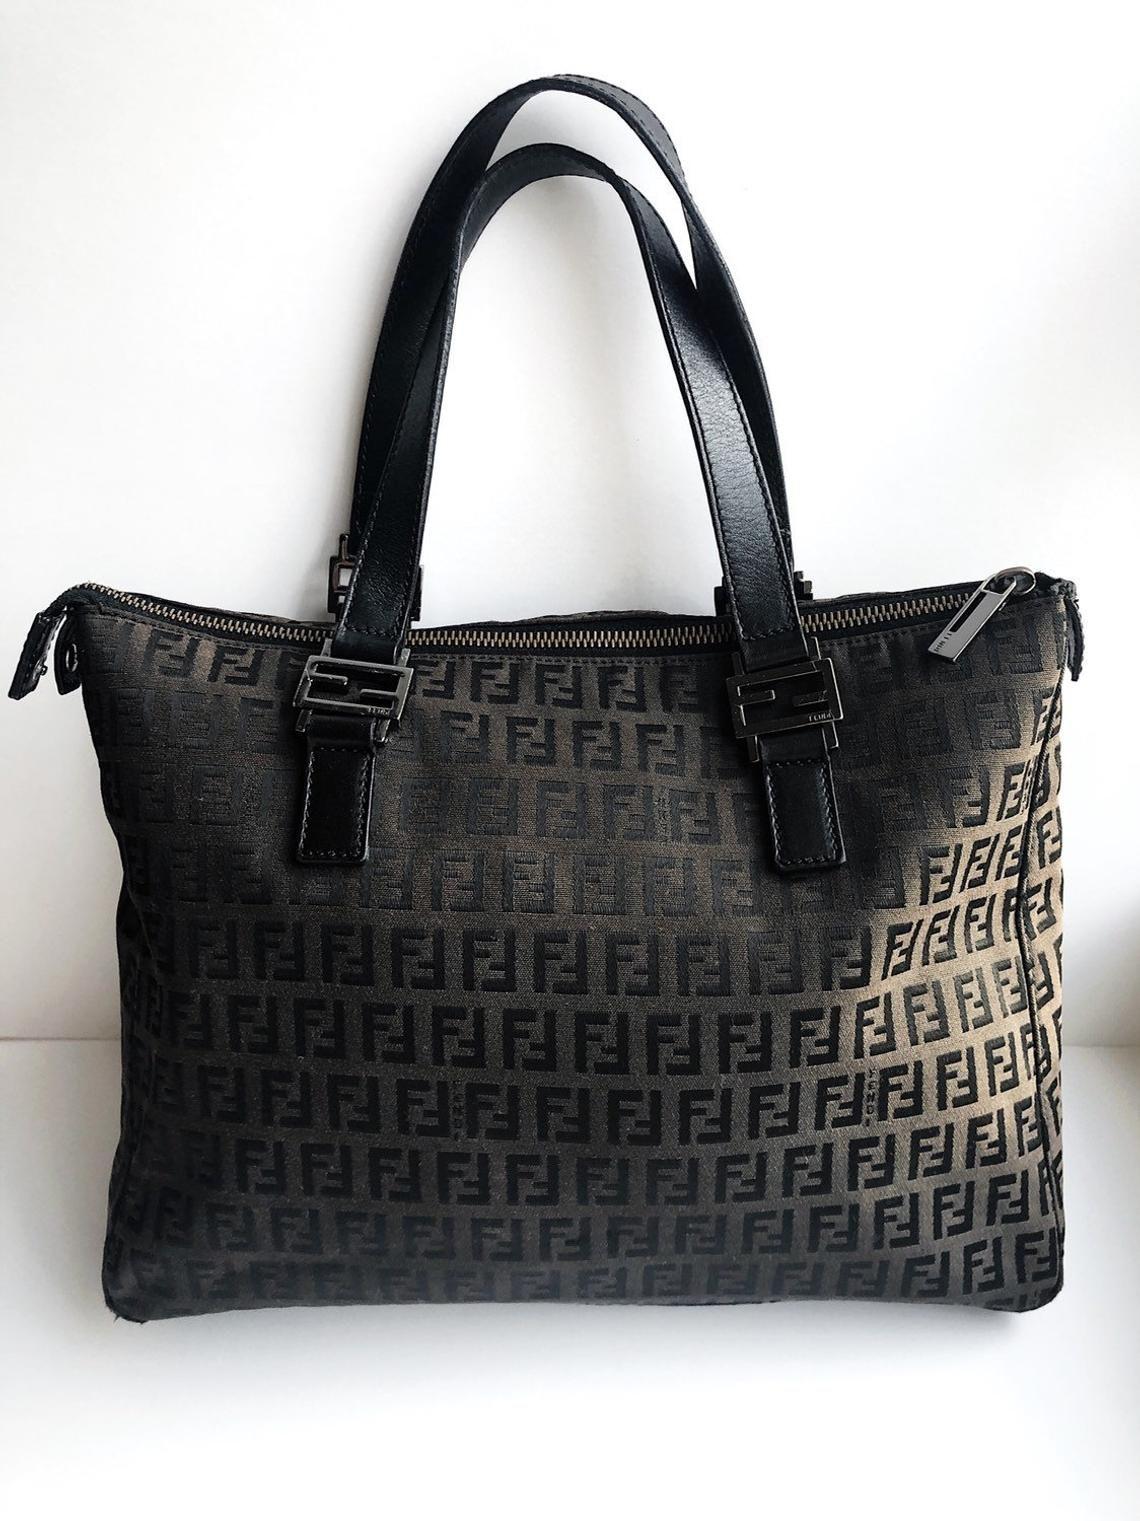 FENDI vintage Zucca logo handbag / monogram print black